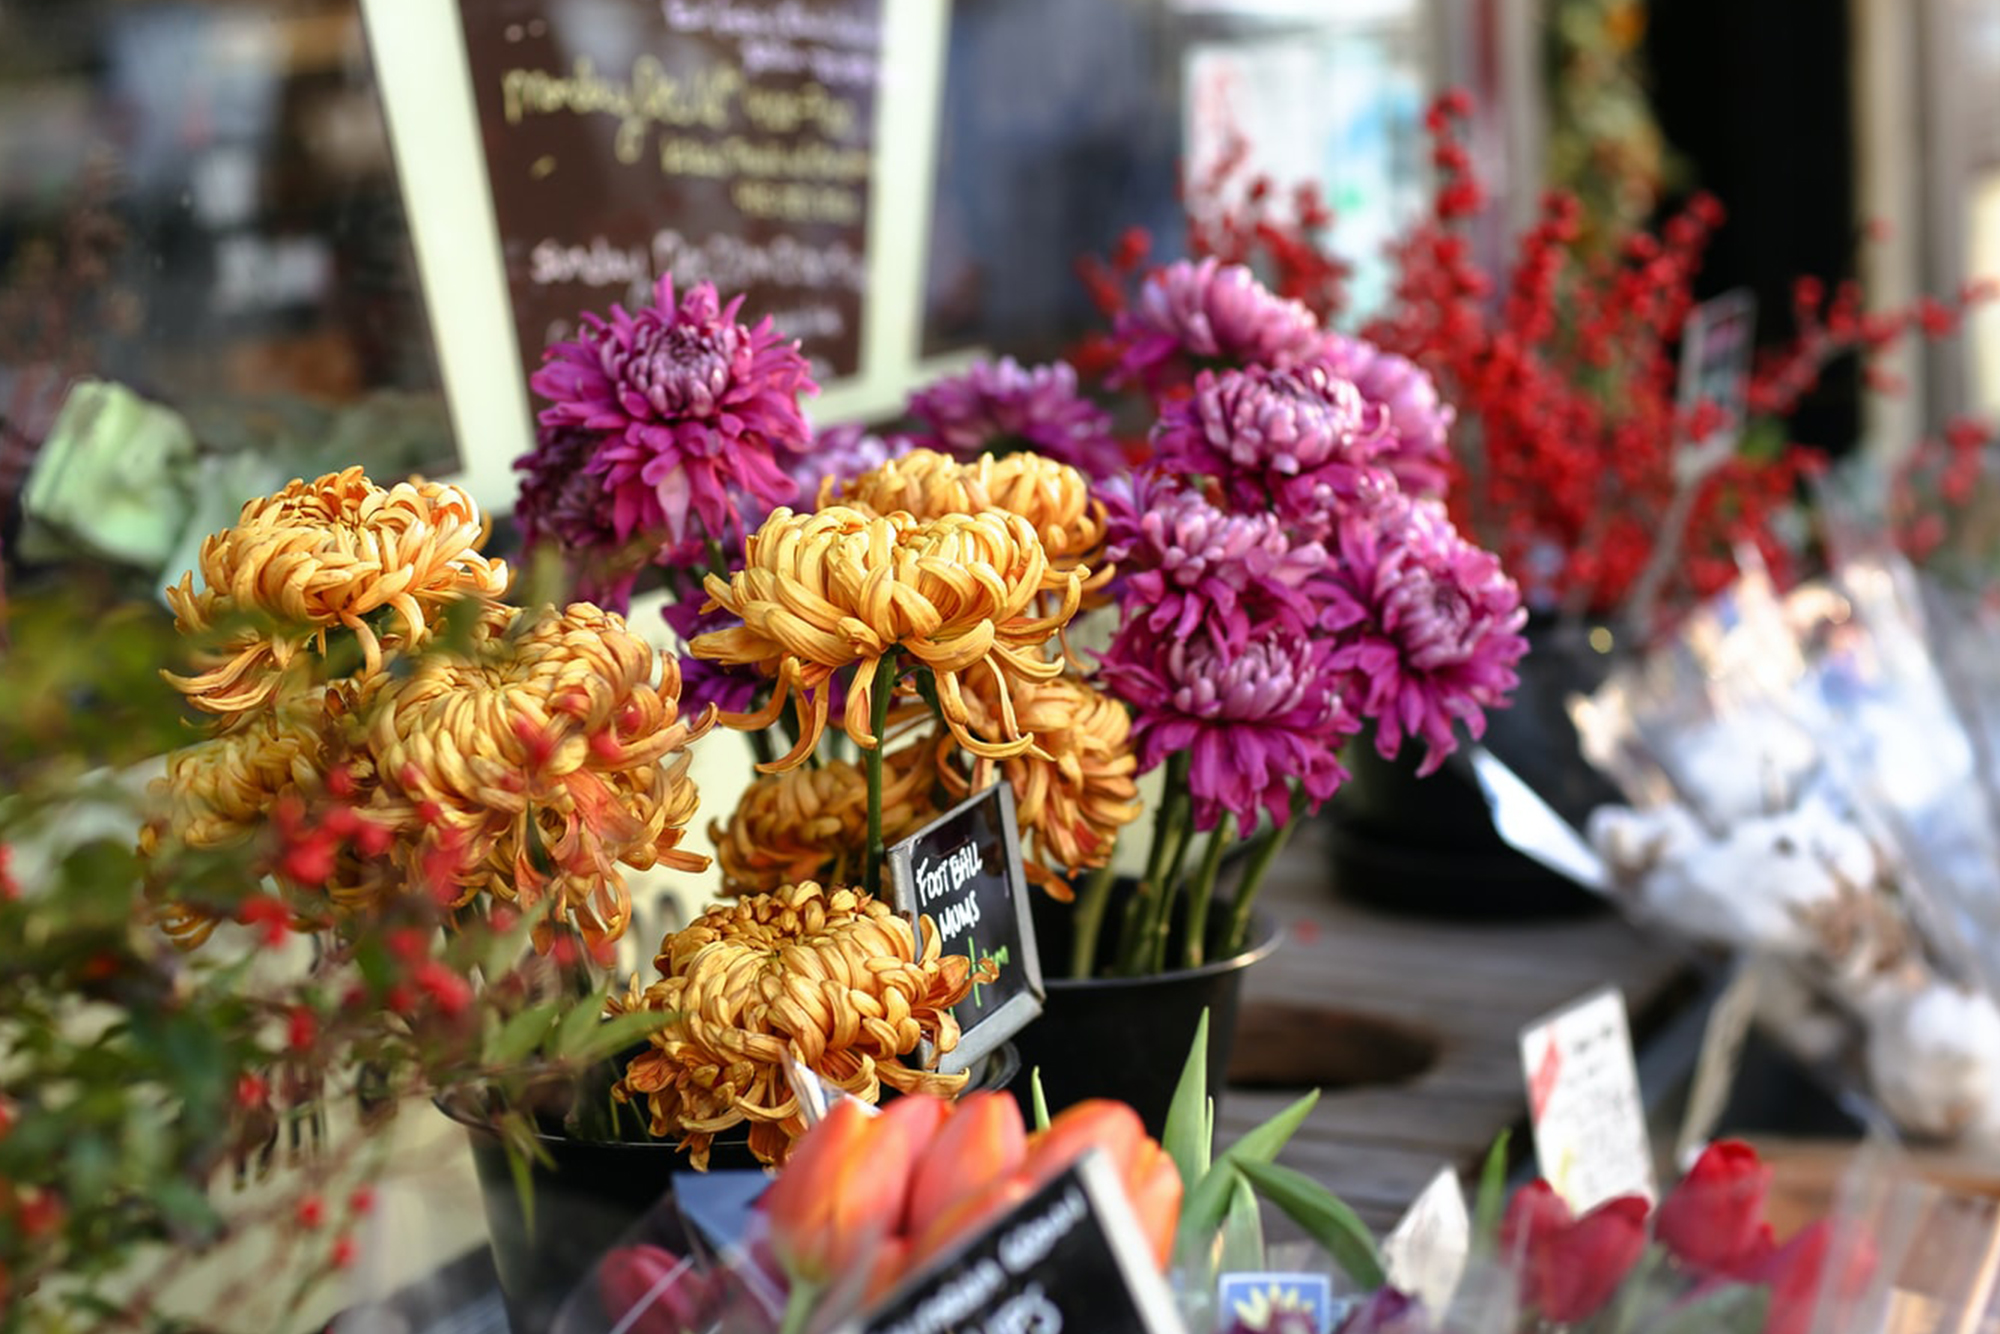 Flower bouquet at a flower store